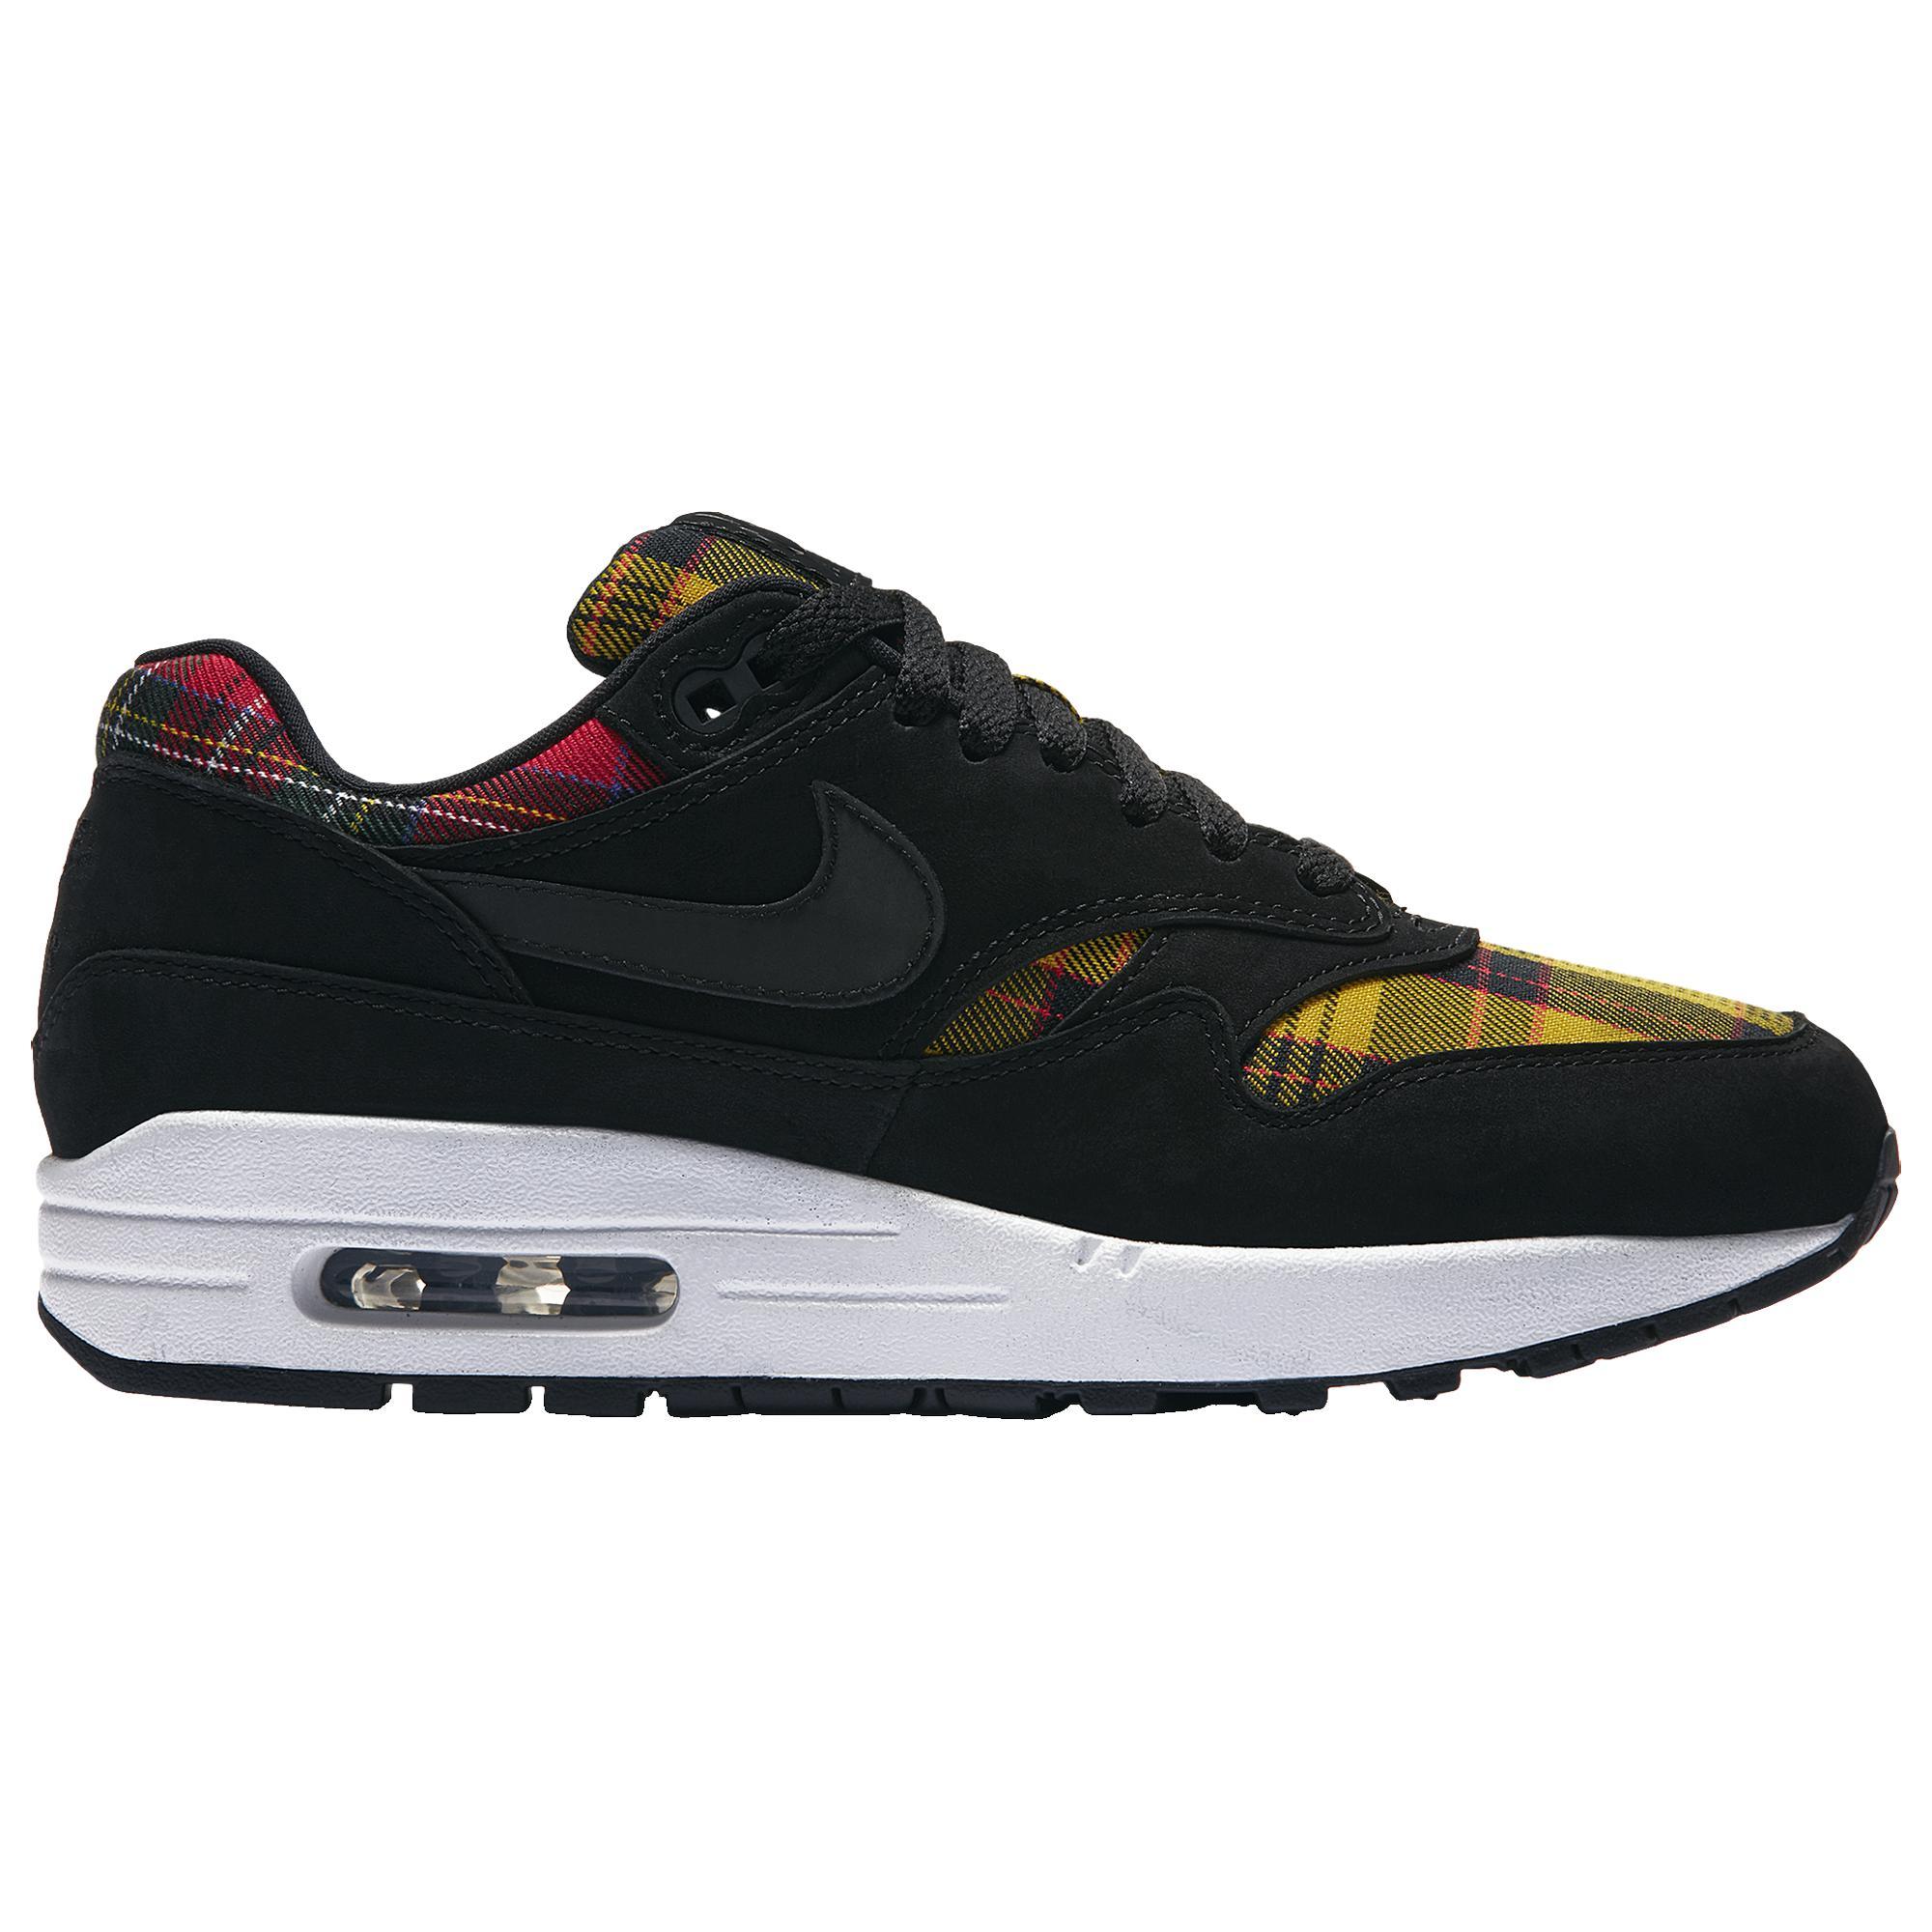 ae75cdd4a1 Nike Air Max 1 Se Nrg in Black - Lyst